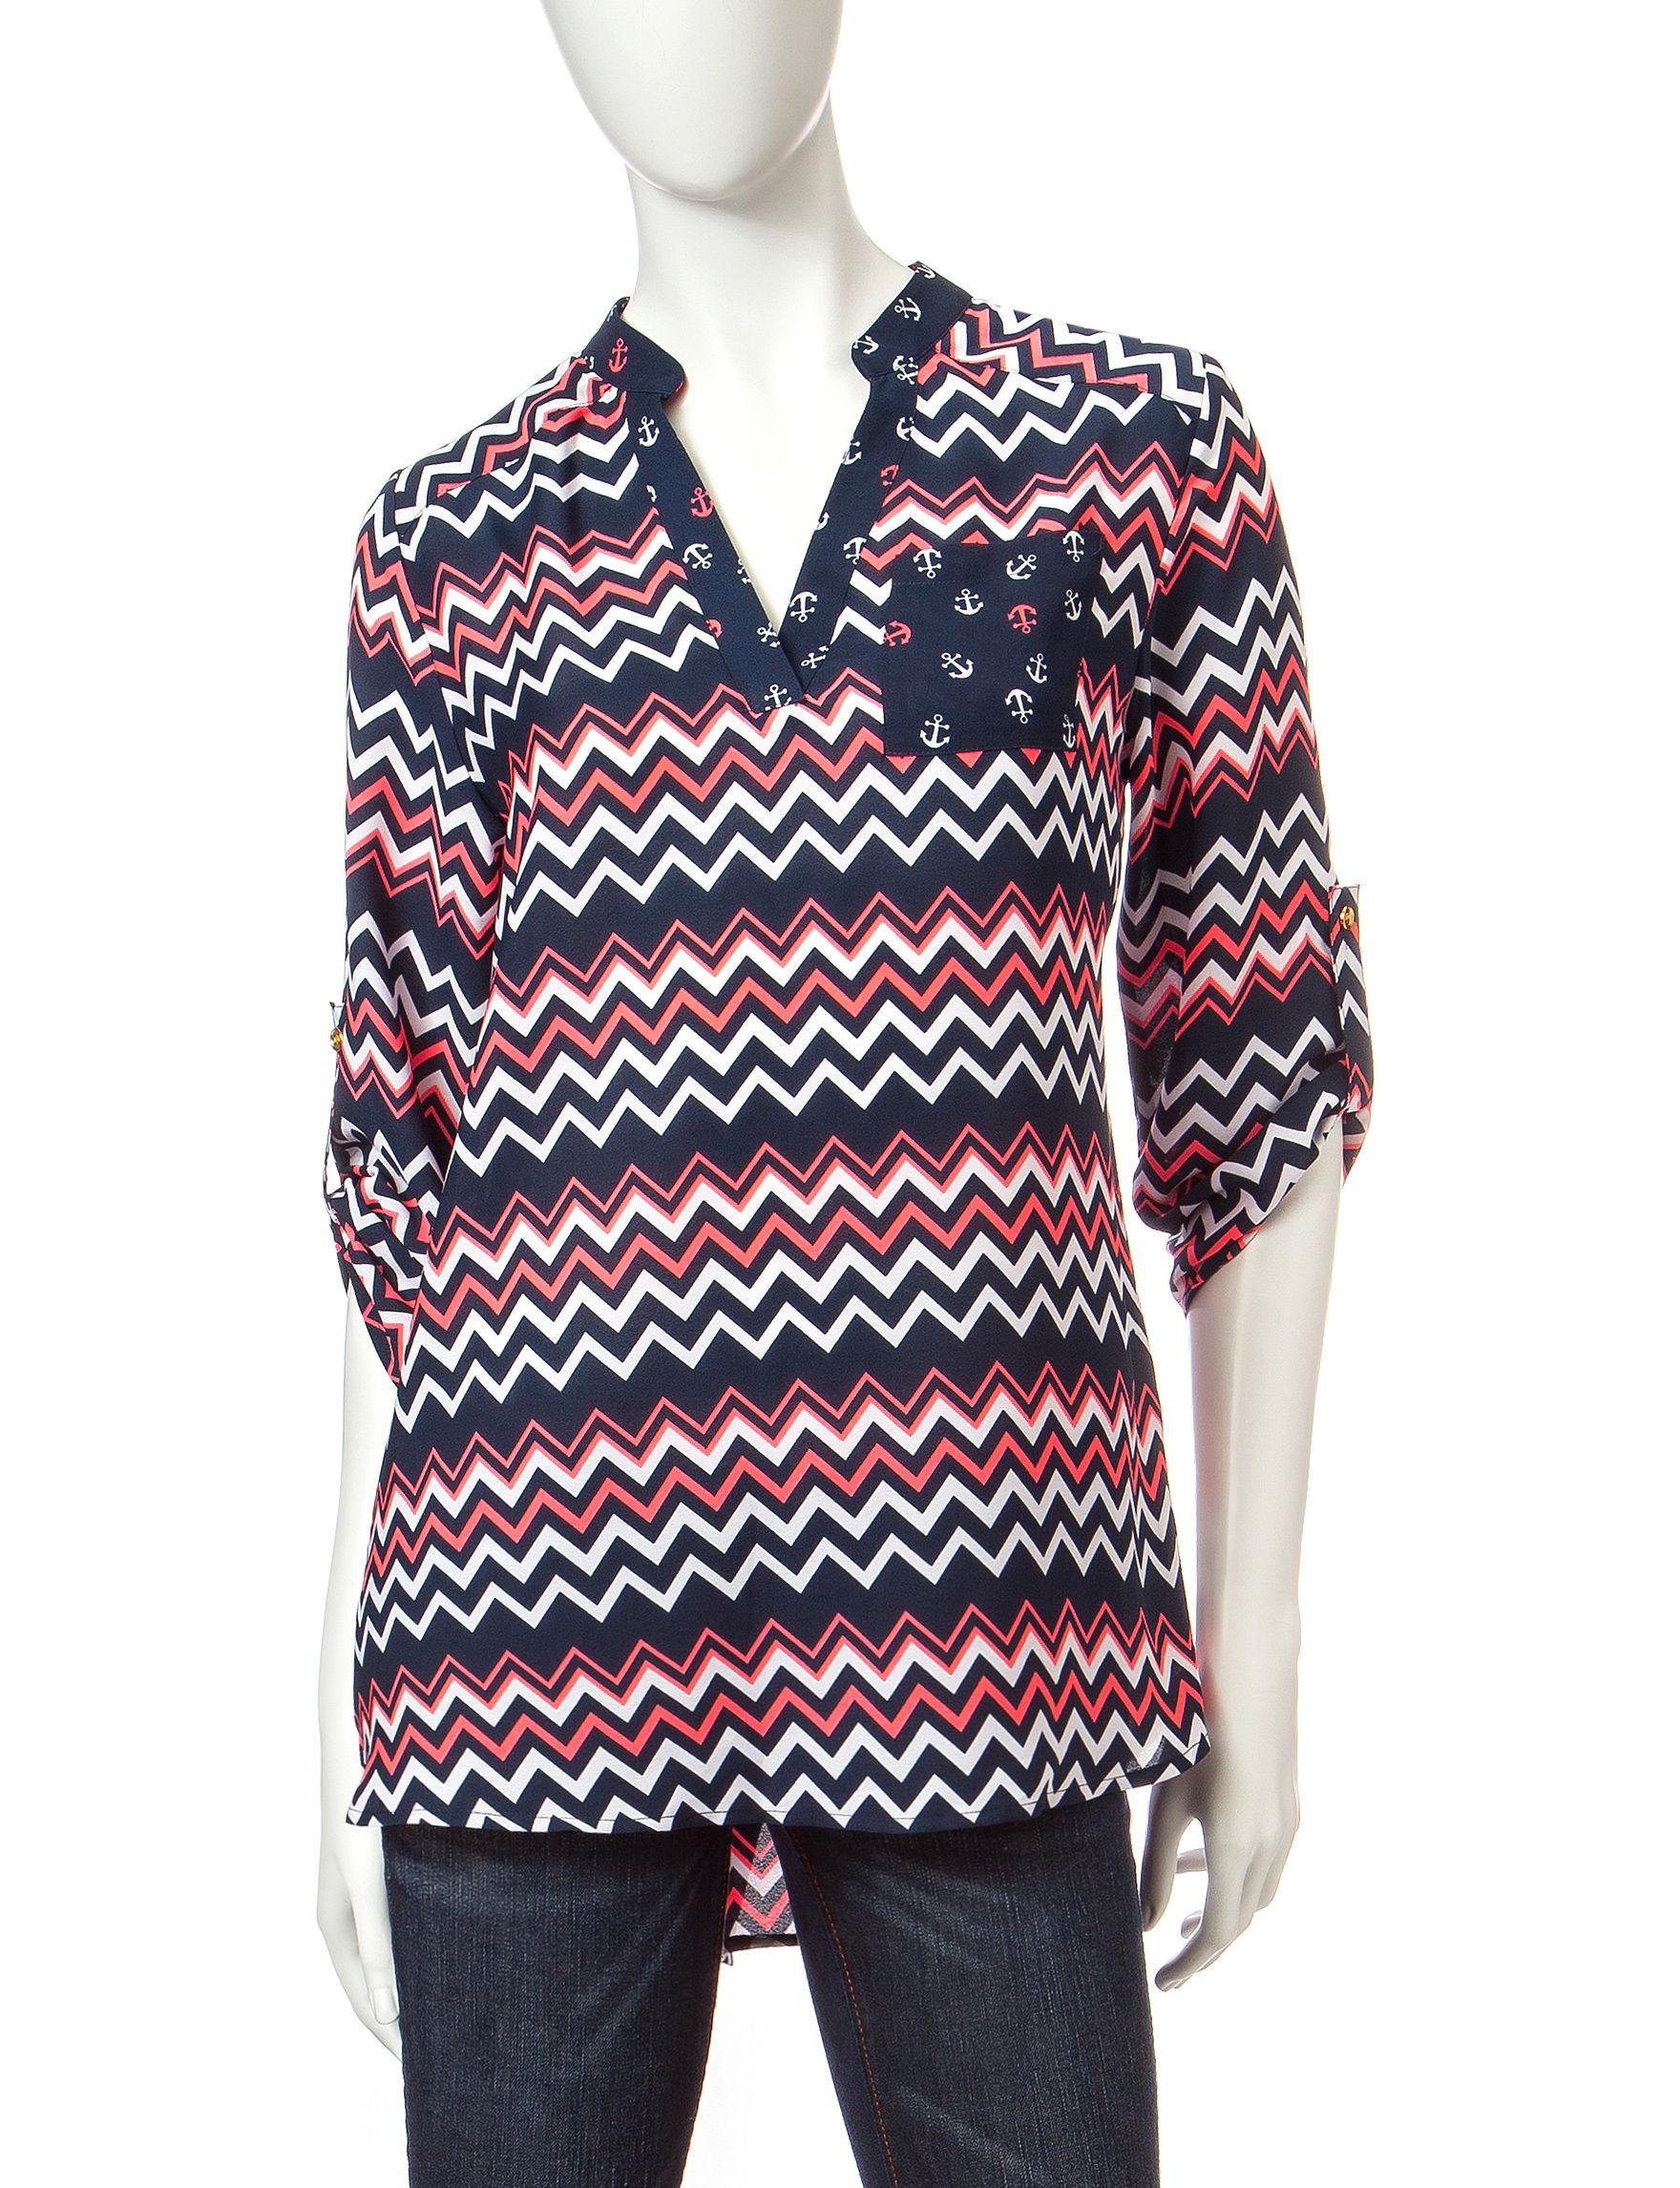 Wishful Park Black/Coral Shirts & Blouses